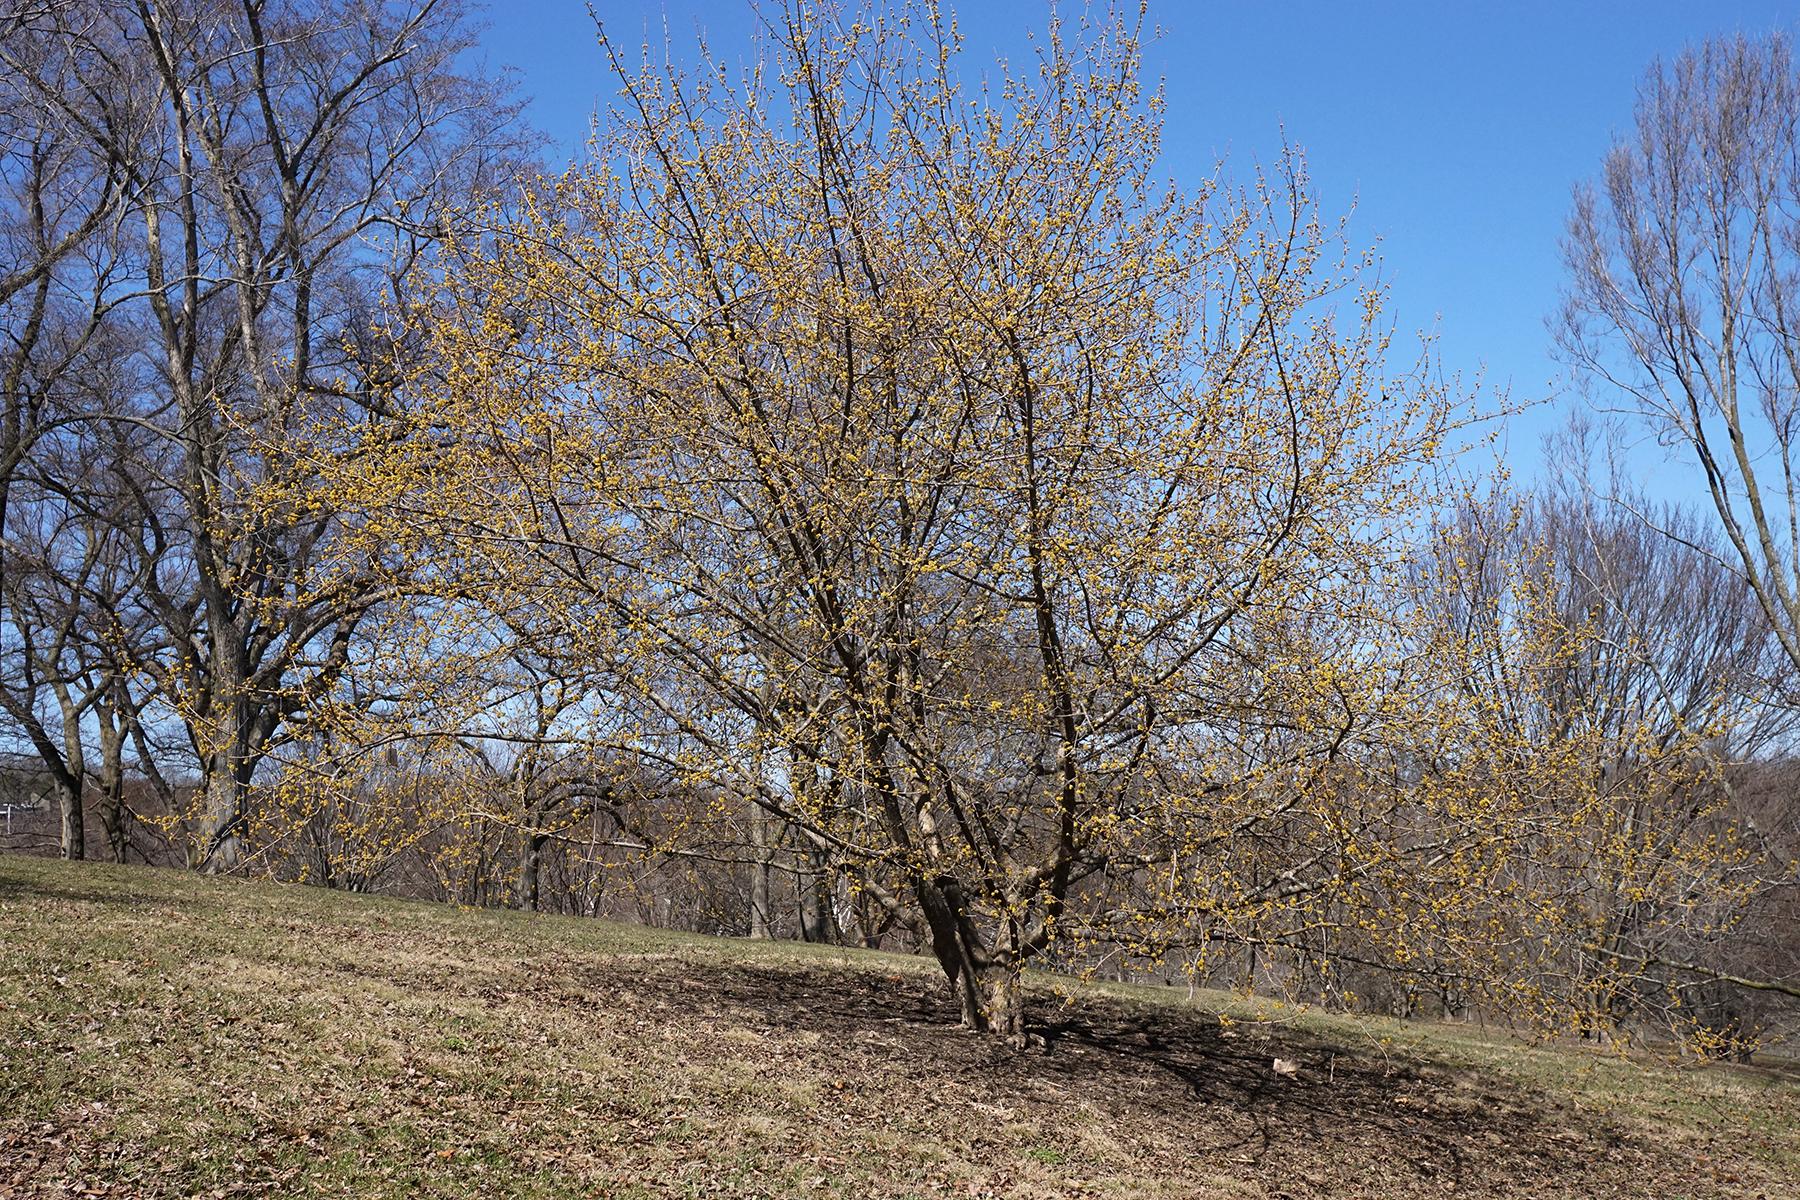 a cornelian cherry tree with light yellow leaves beginning to set.